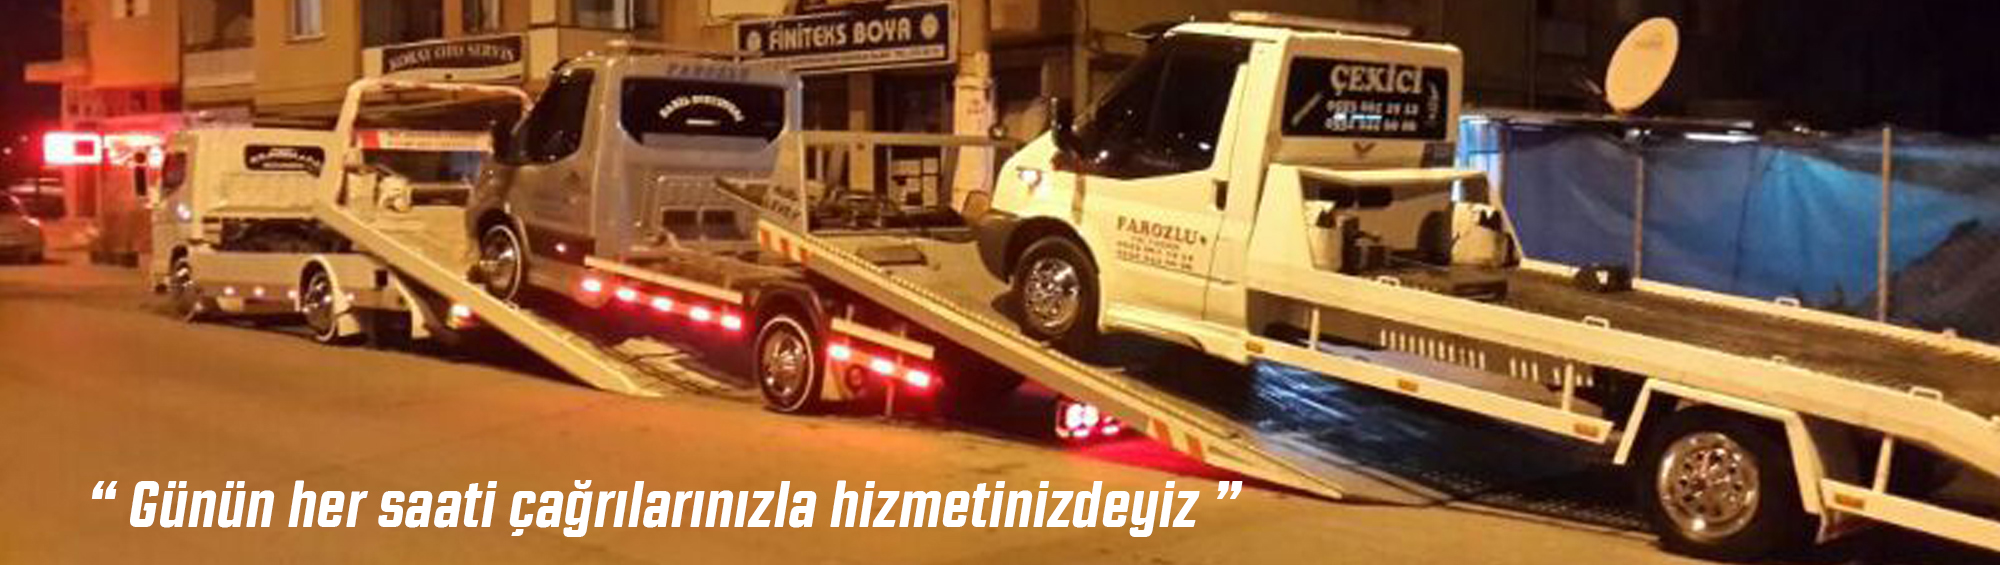 Oto Kurtarma İzmir, Oto Çekici İzmir